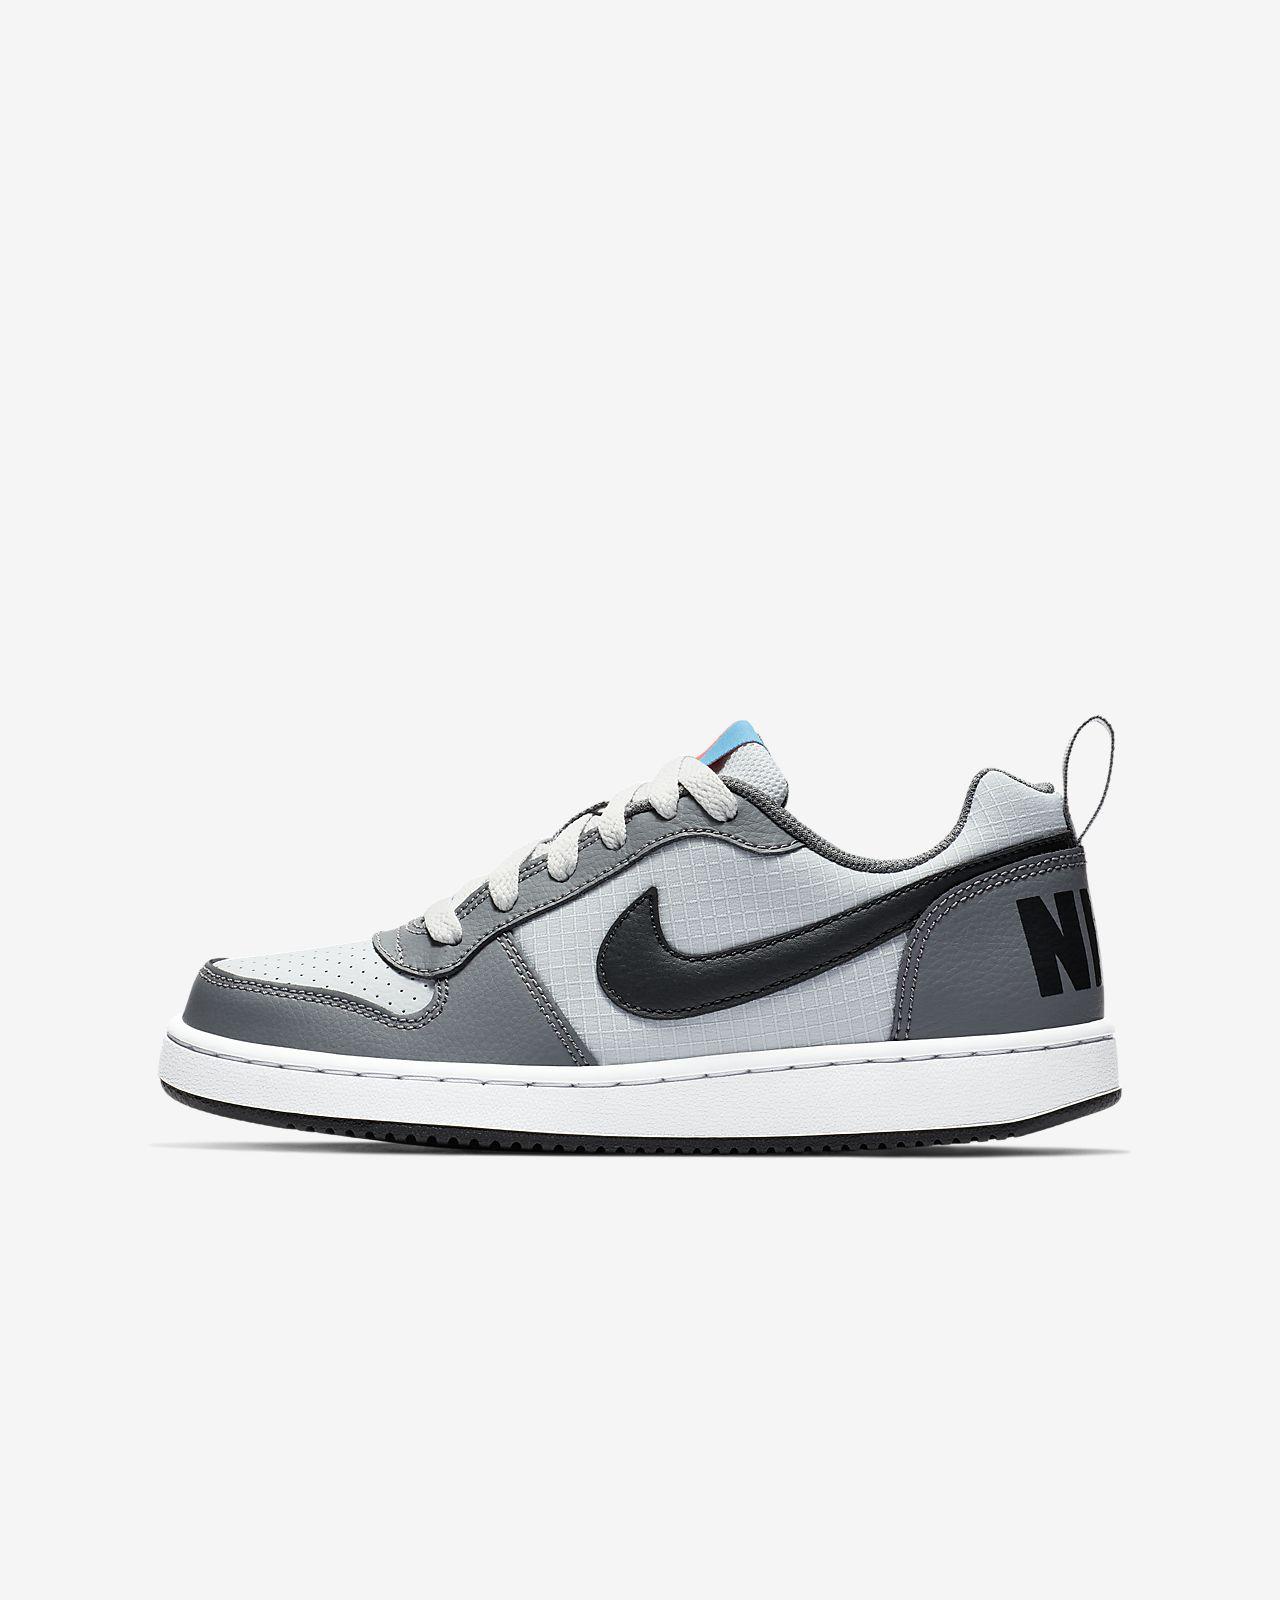 7829db920 Nike Court Borough Low Zapatillas - Niño a. Nike.com ES